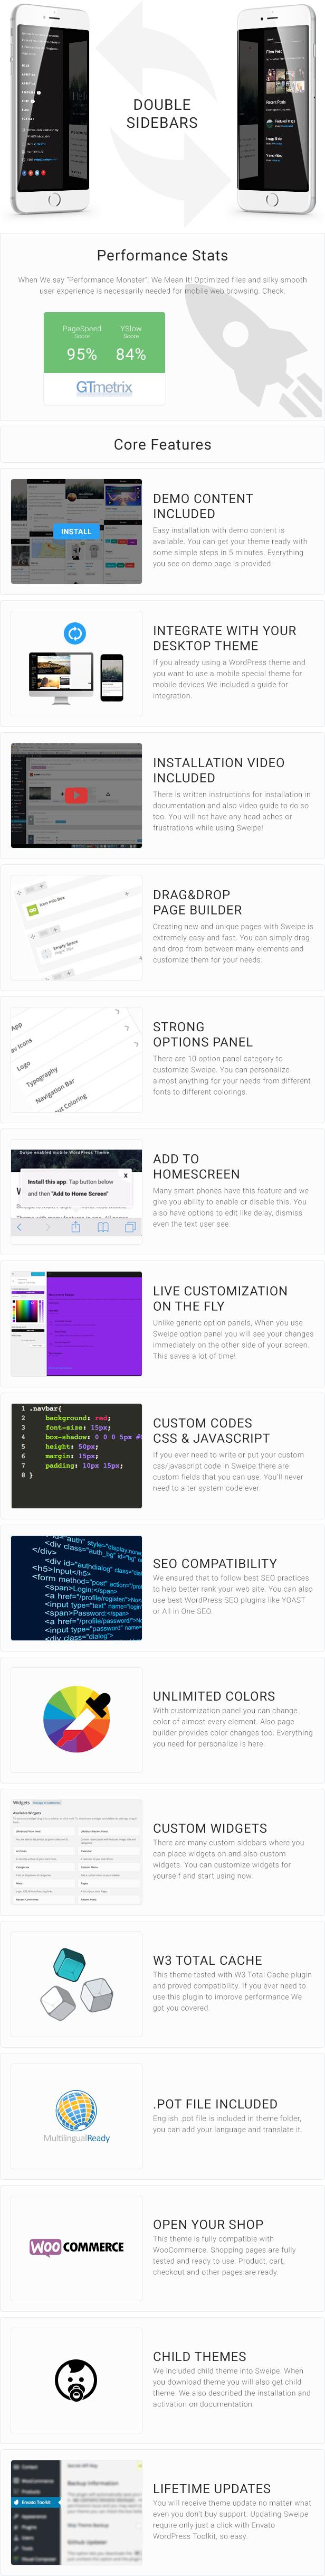 Sweipe - Responsive WordPress Mobile Theme - 6